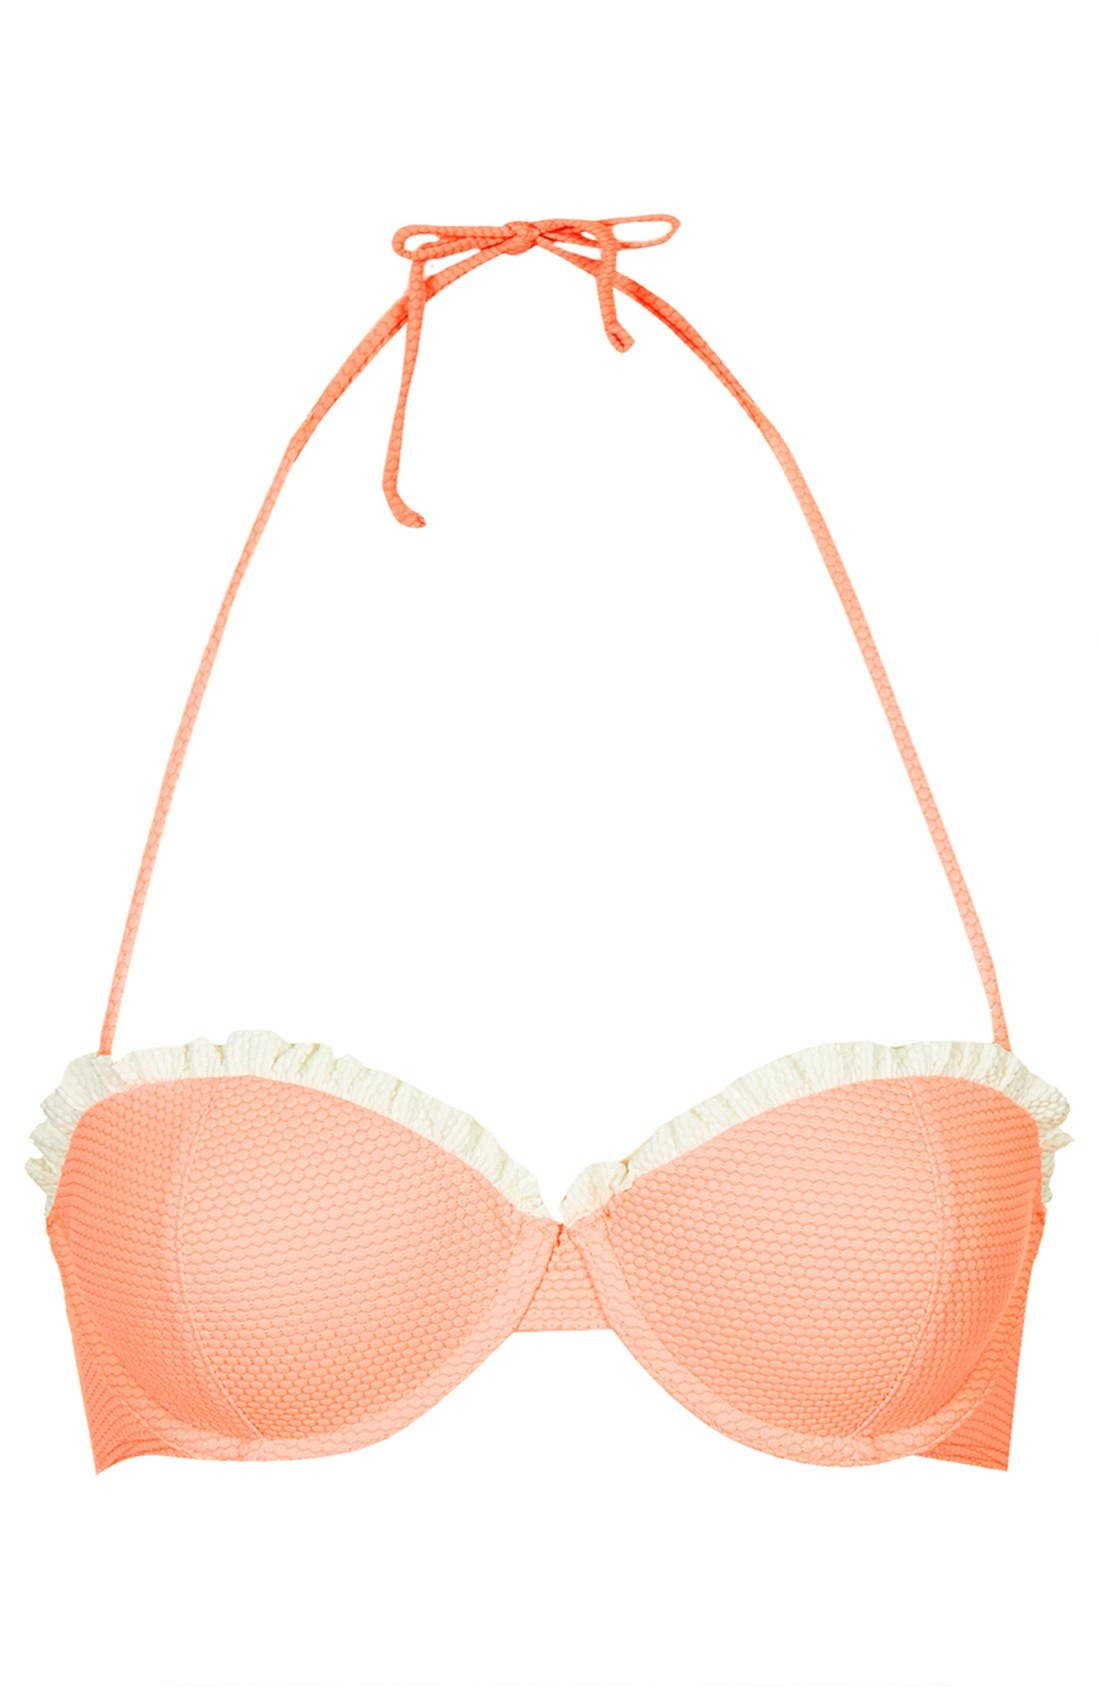 Alternate Image 1 Selected - Topshop Ruffle Trim Push-Up Bikini Top